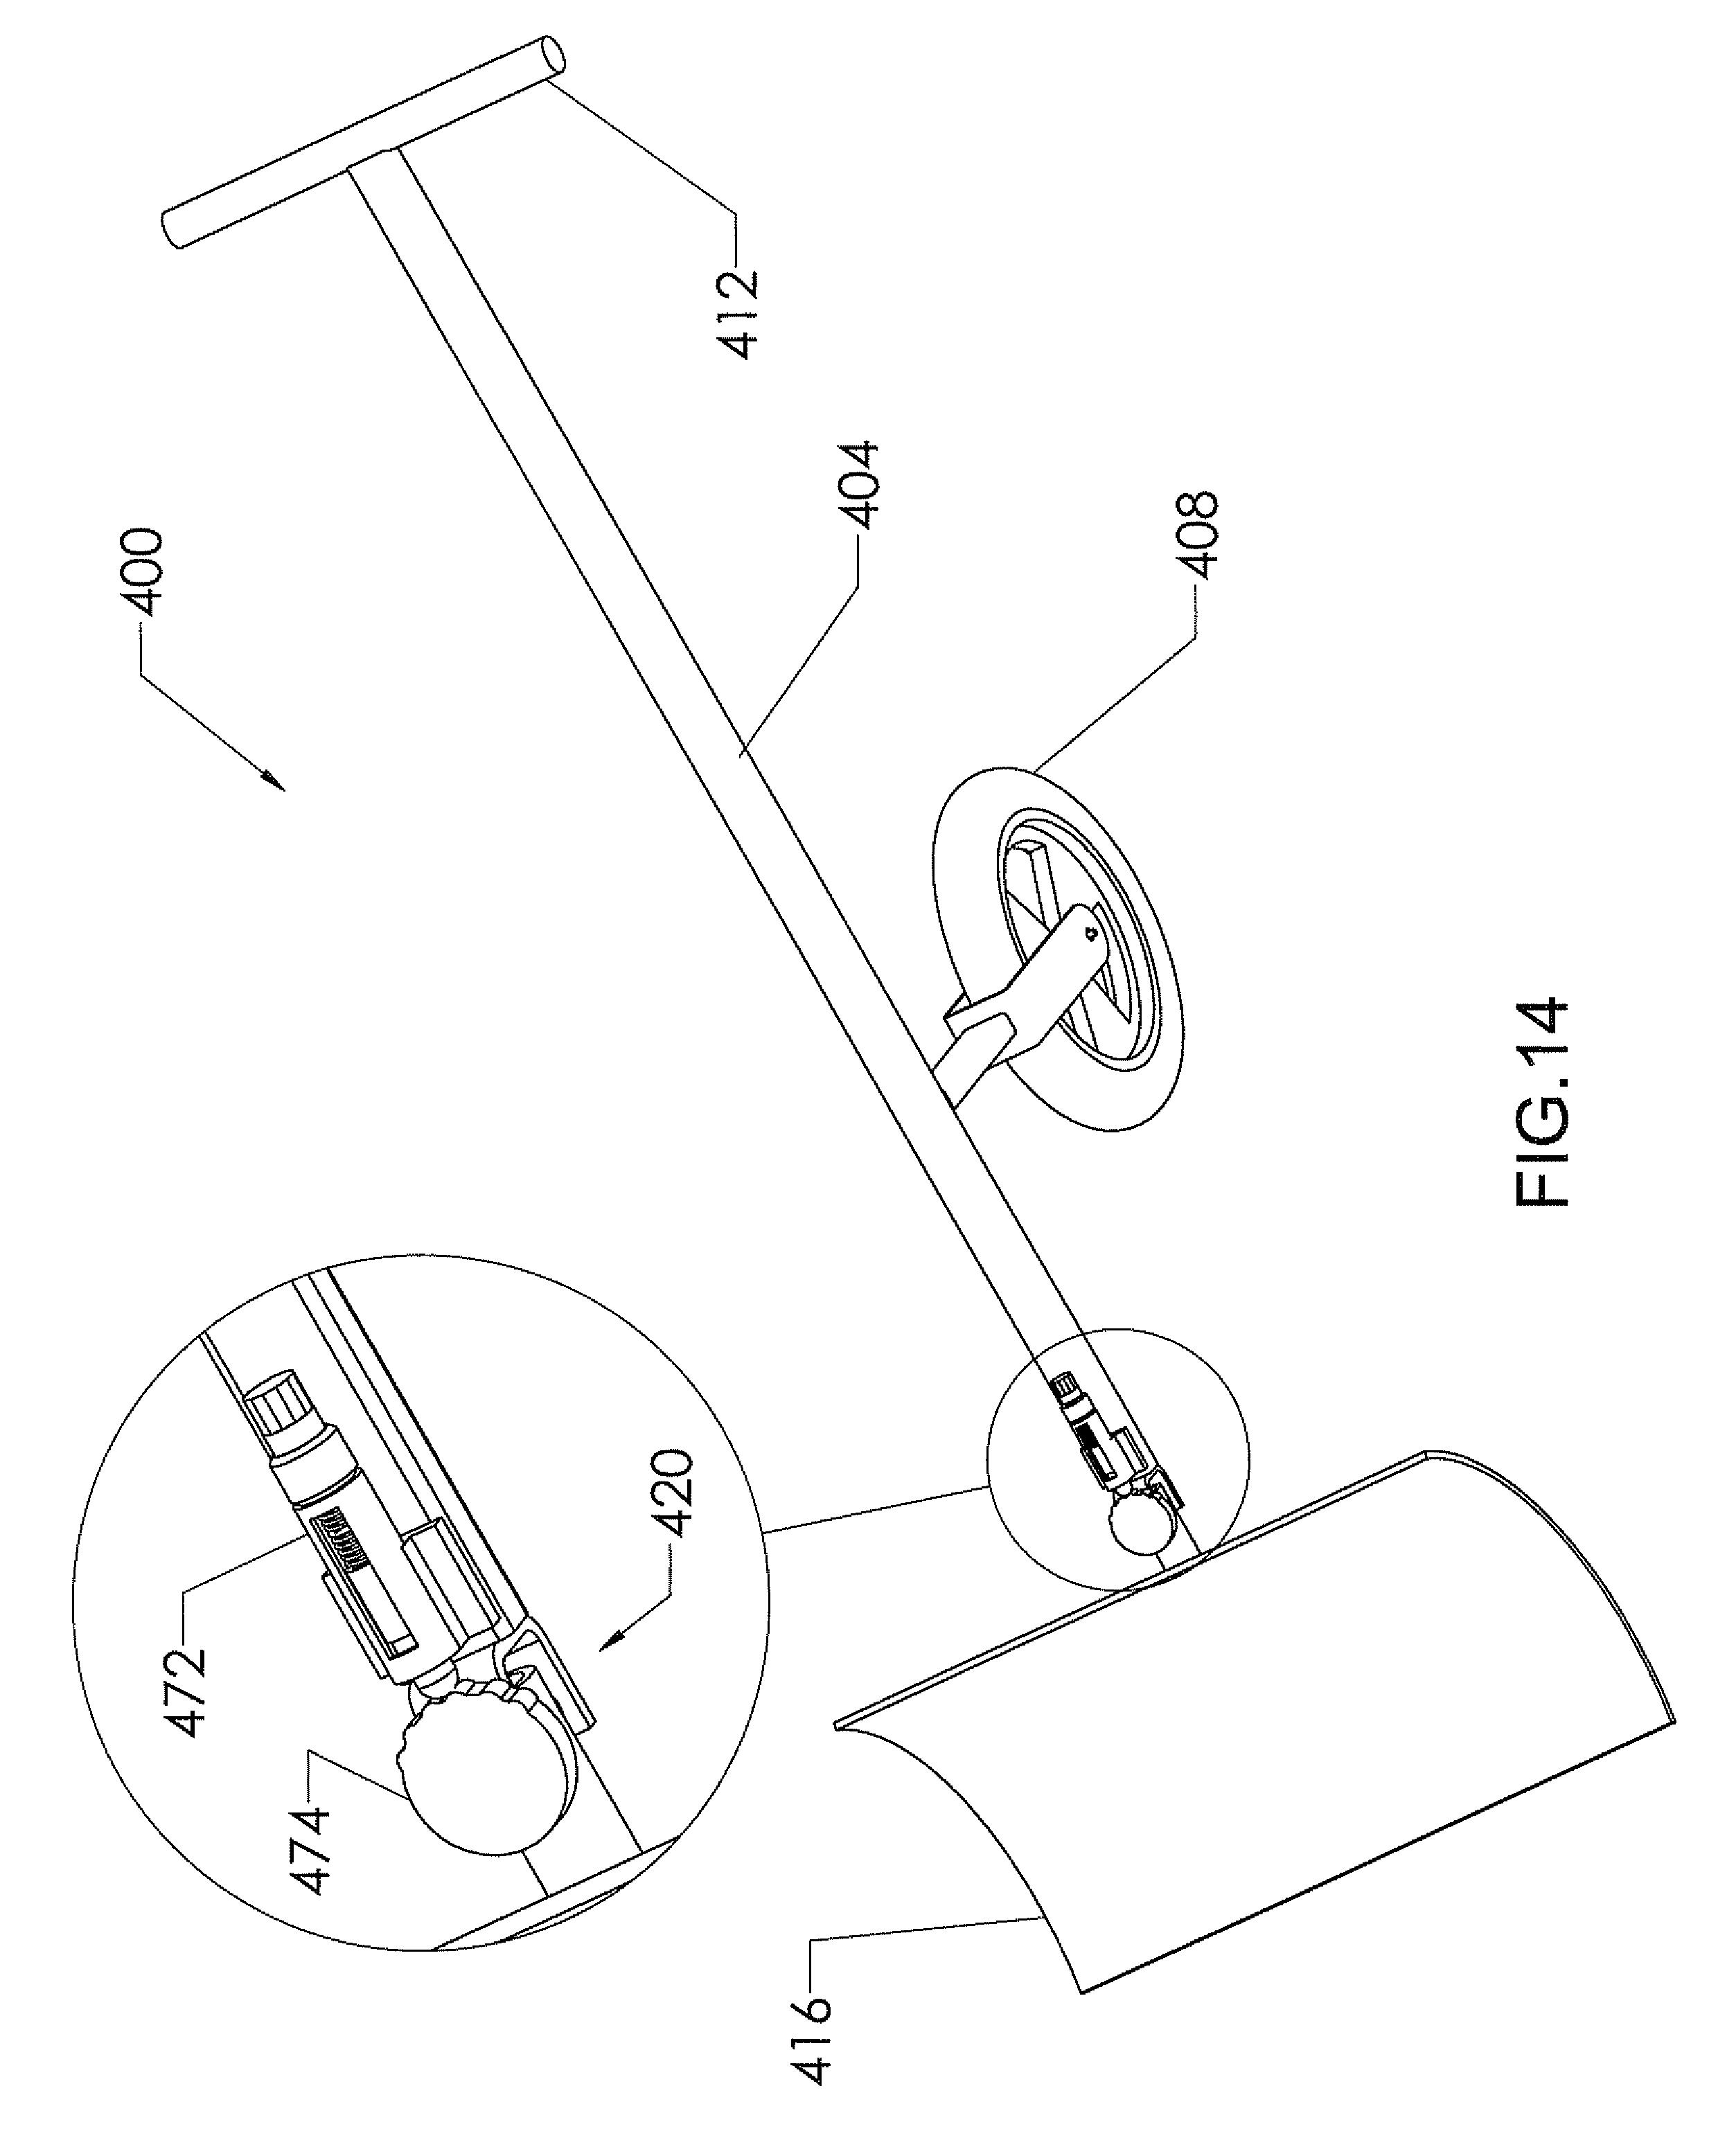 us8001707 manually operated wheeled snow shovels Spring Shovel patent drawing